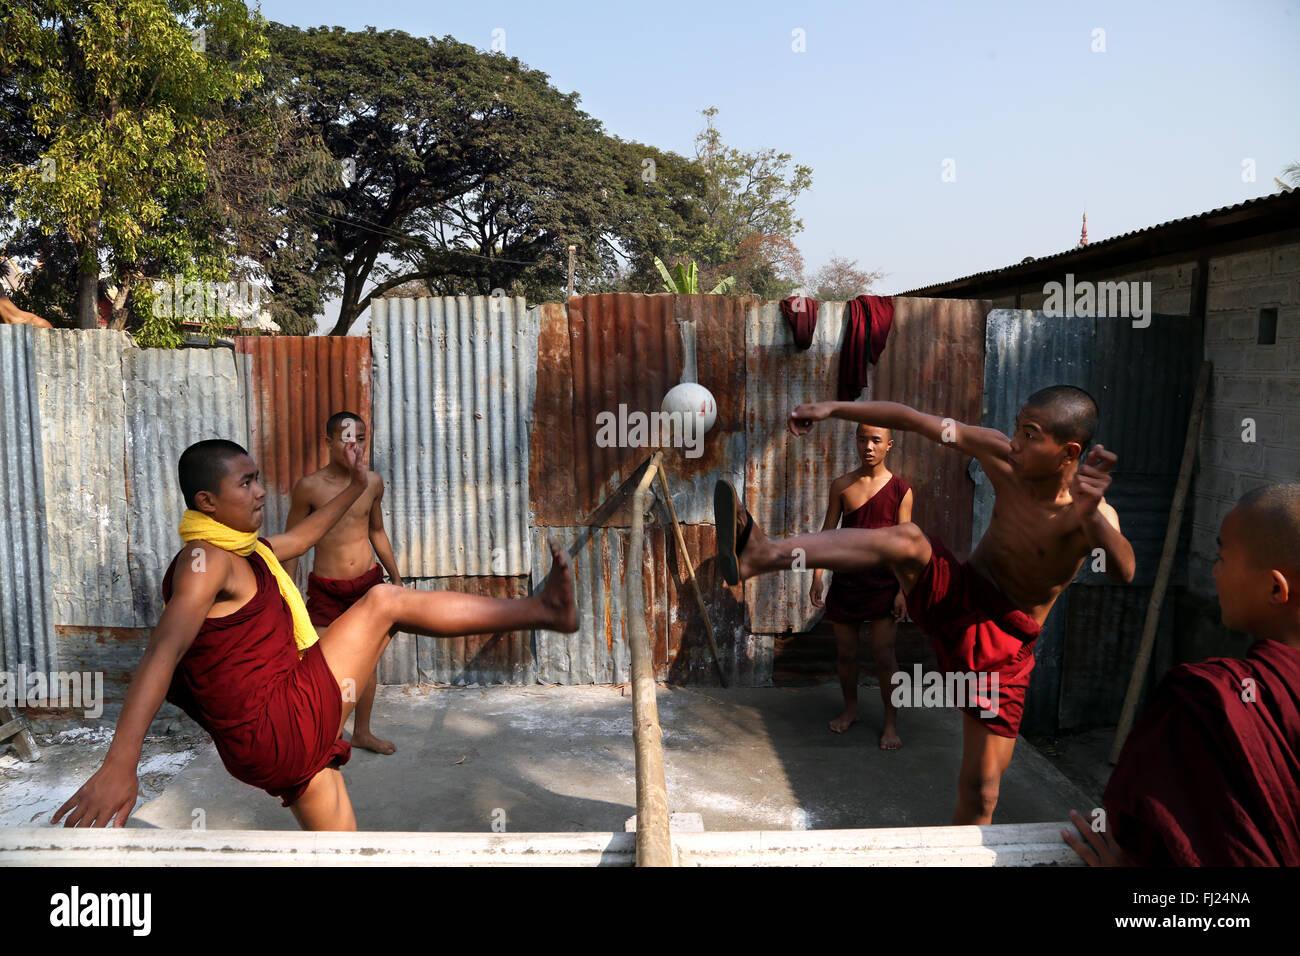 I monaci buddisti a giocare a calcio in monastero, di Nyaung Shwe, Myanmar Immagini Stock